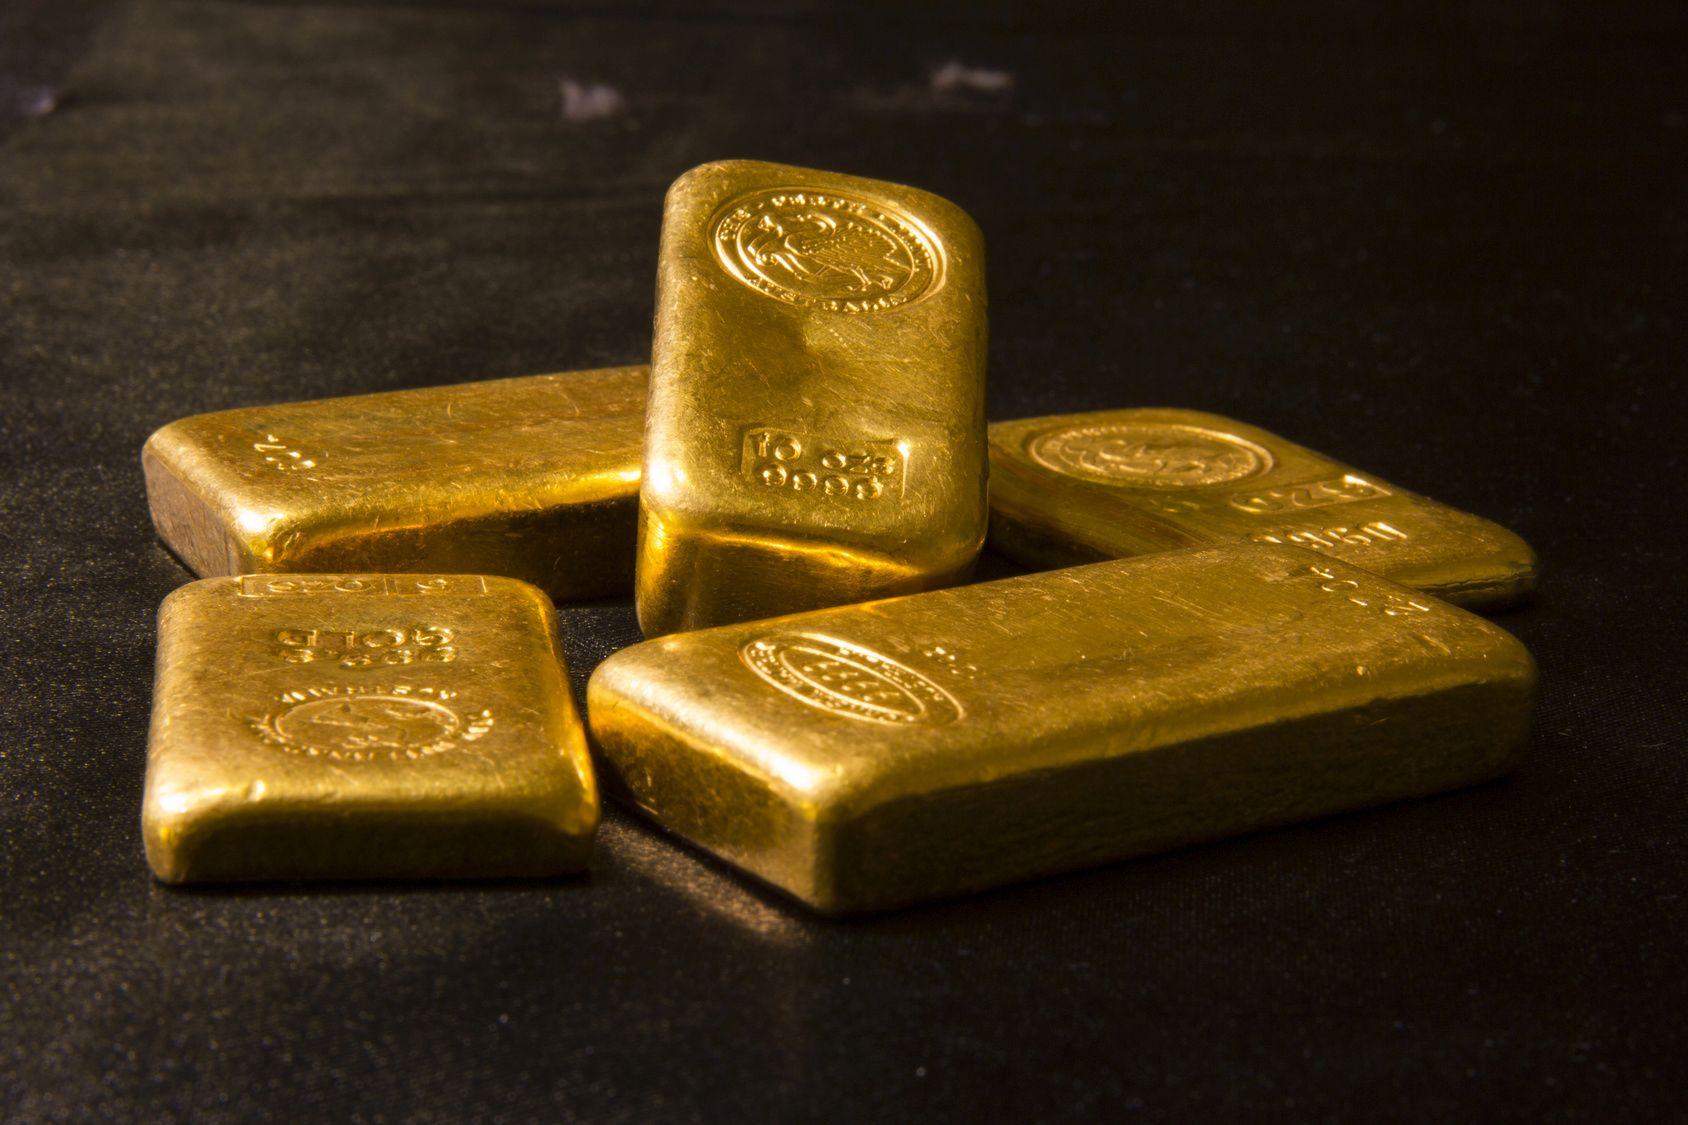 W superbly Ile kosztuje złoto? - Bancovo.pl DU17